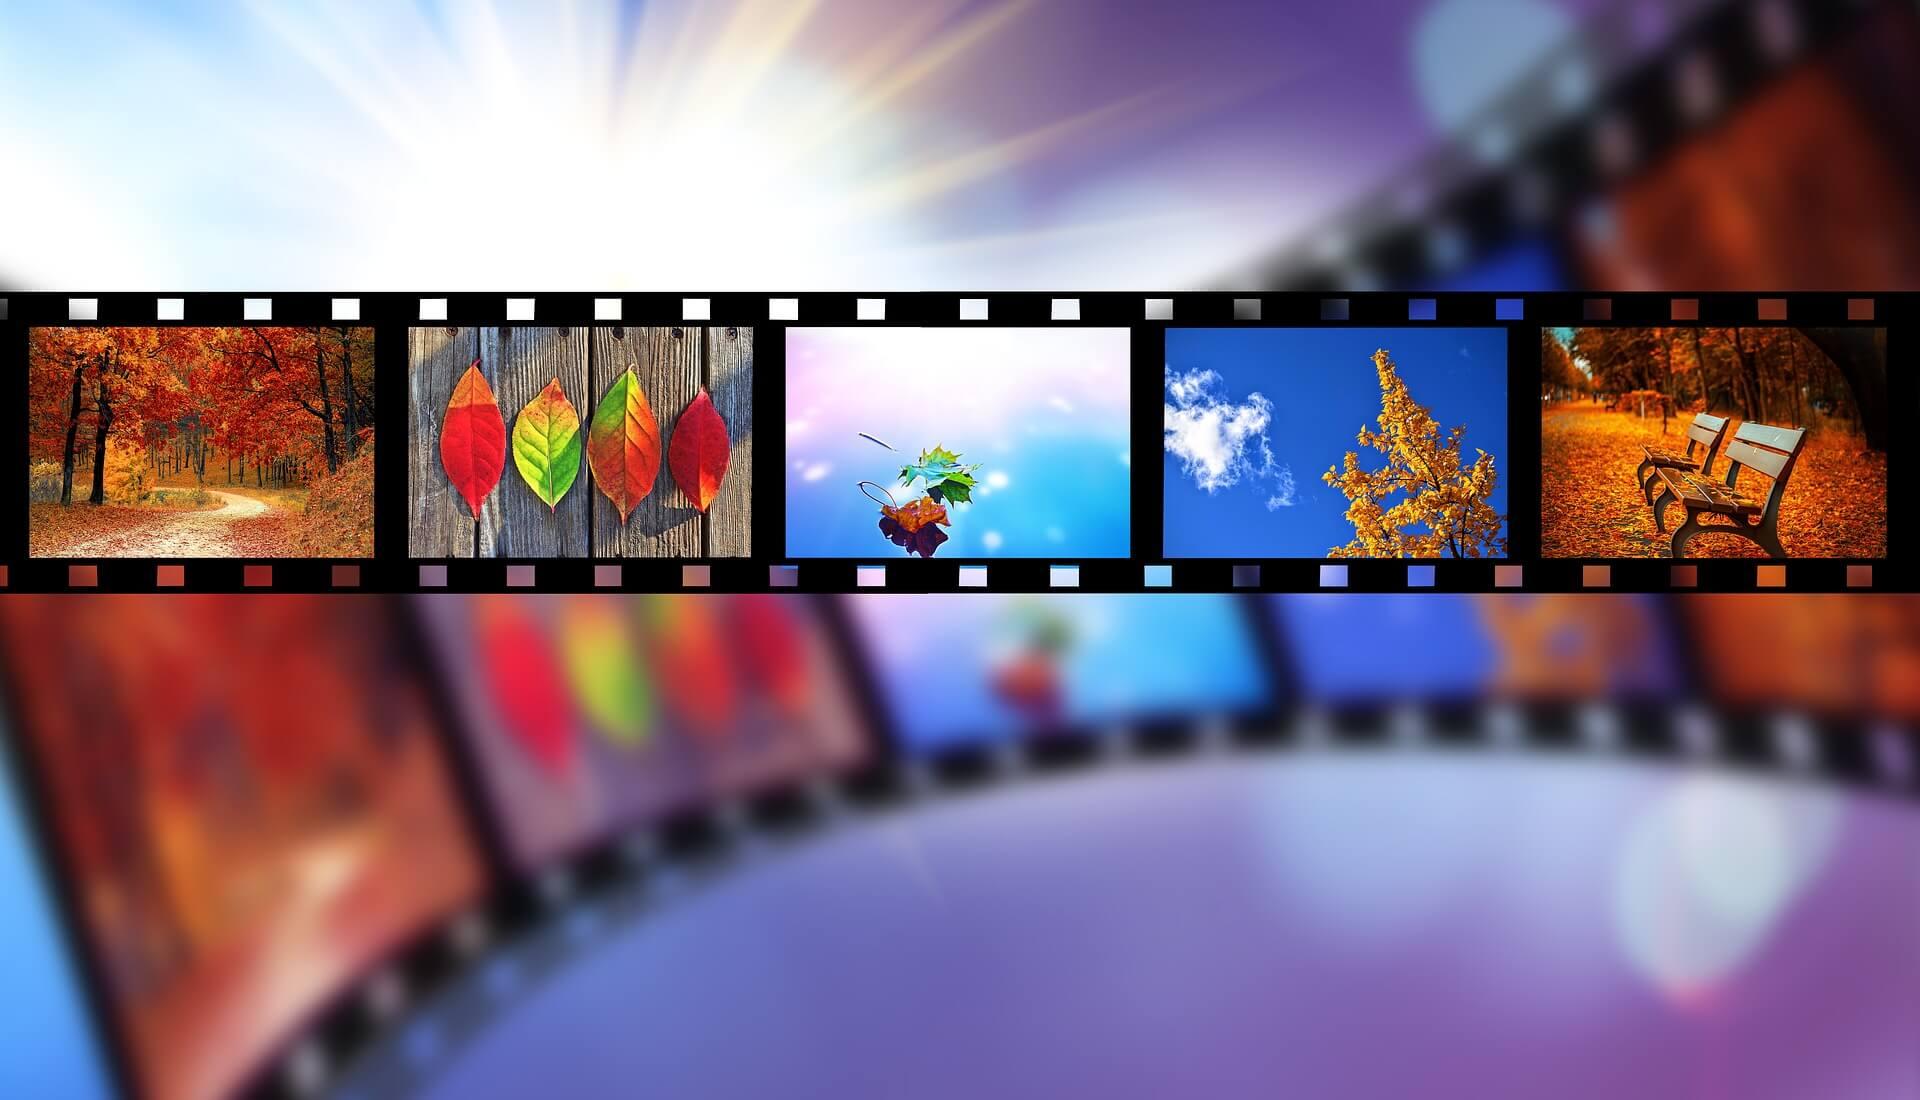 Video frames